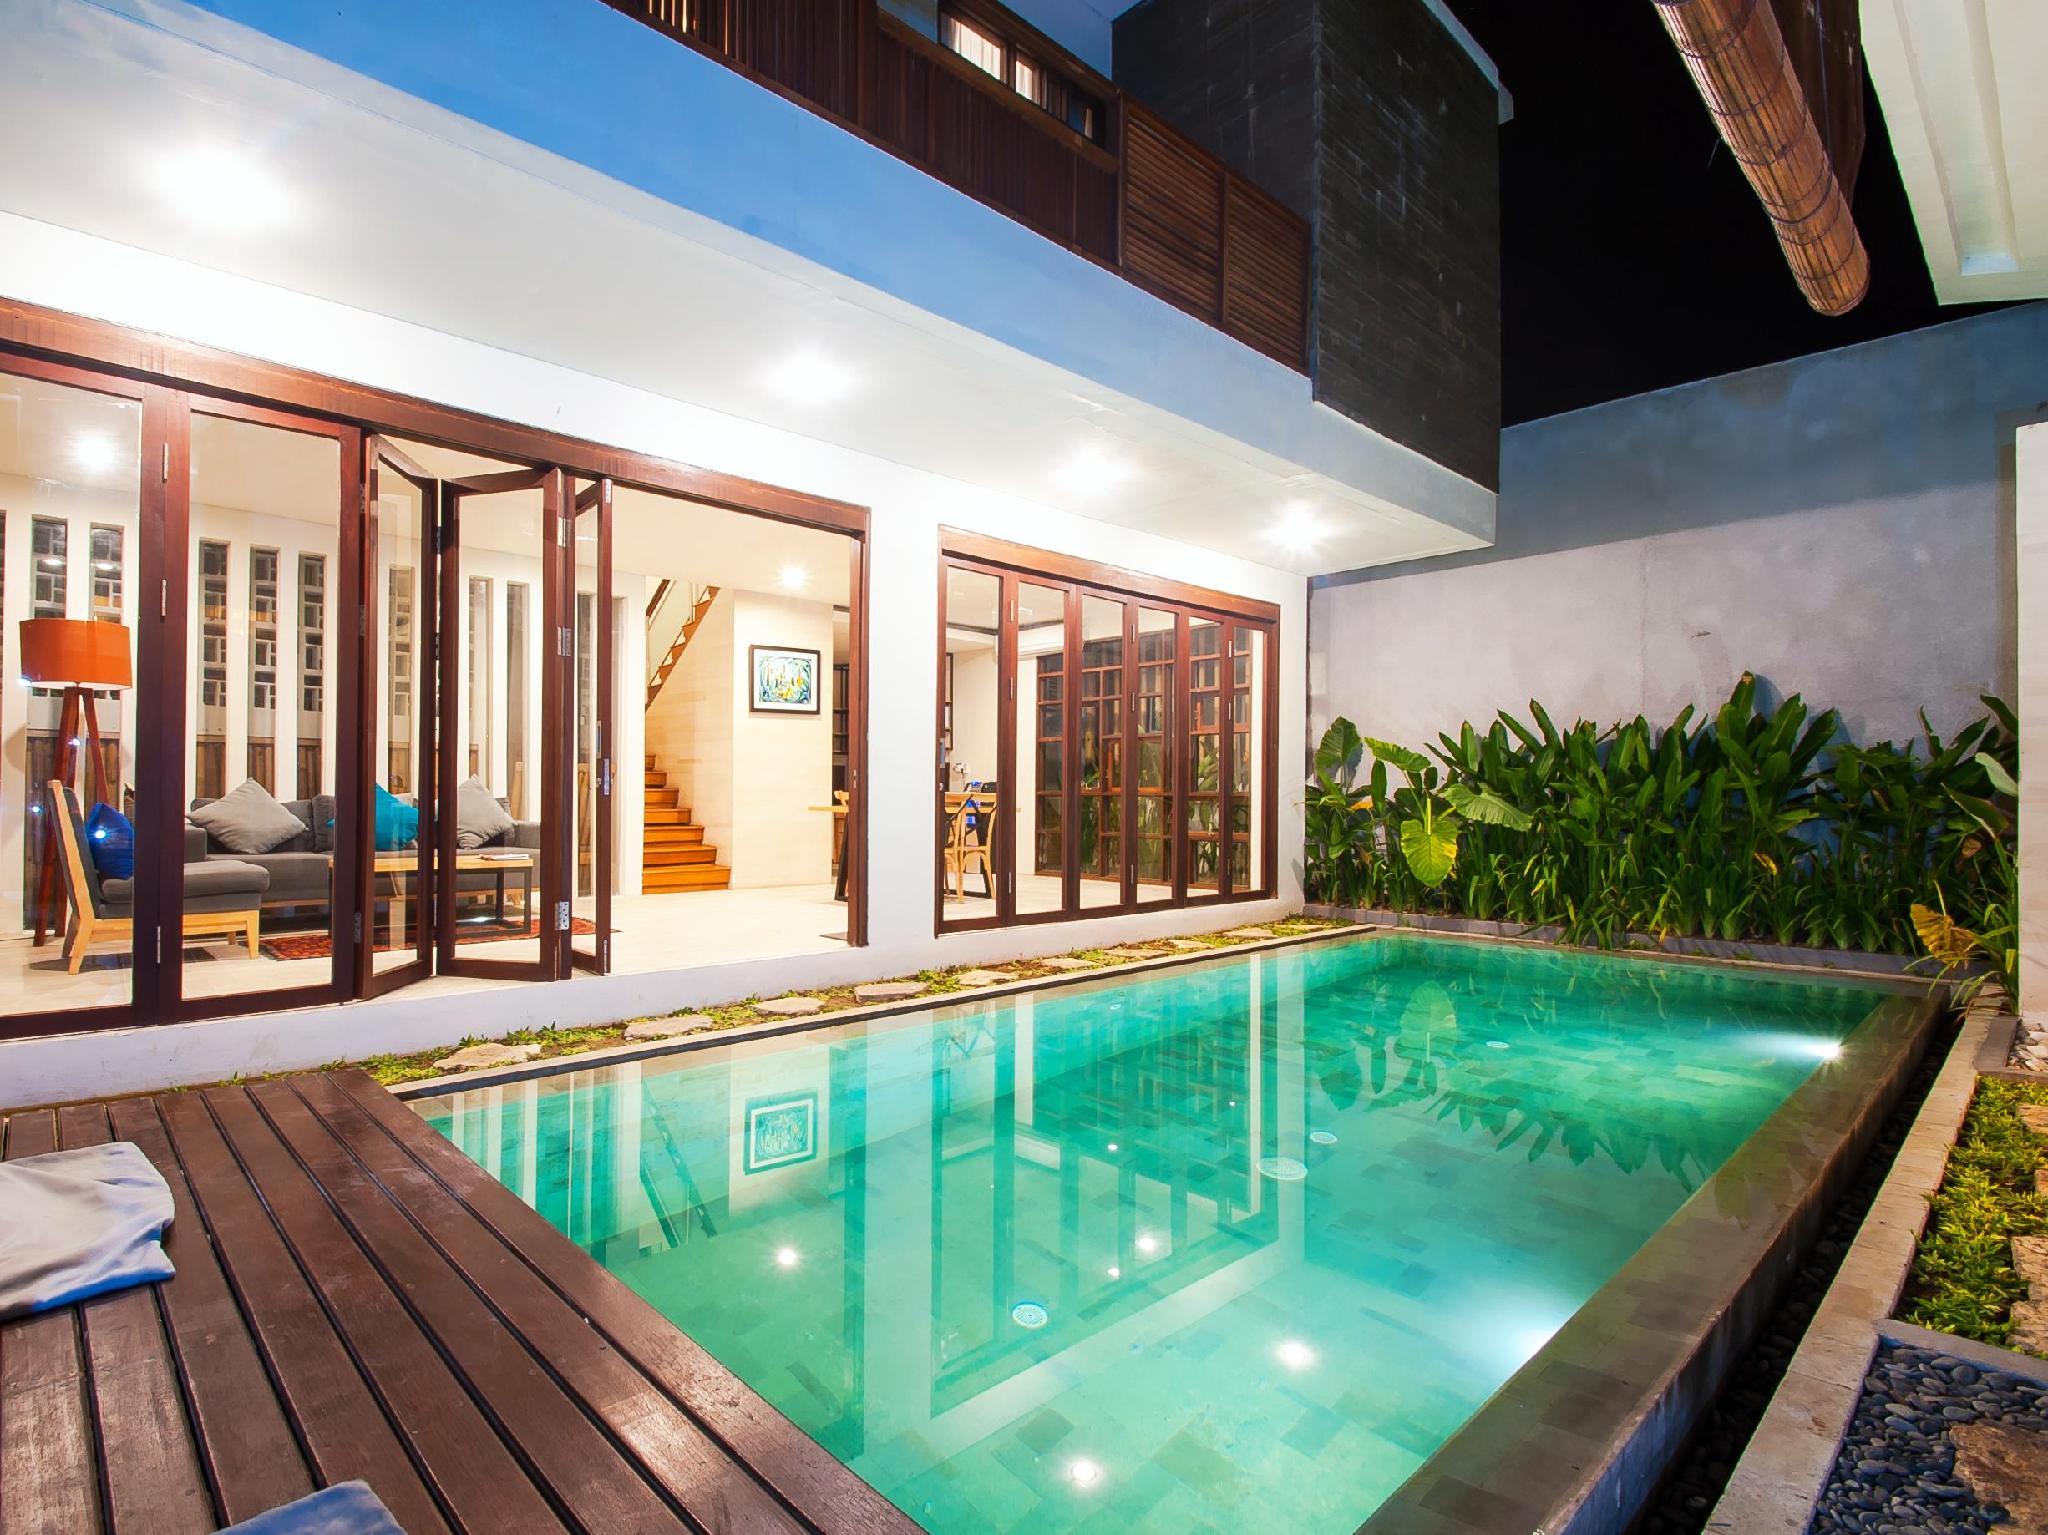 The Royal Bali Villas Canggu By Bali Family Hospitality Hotel Murah